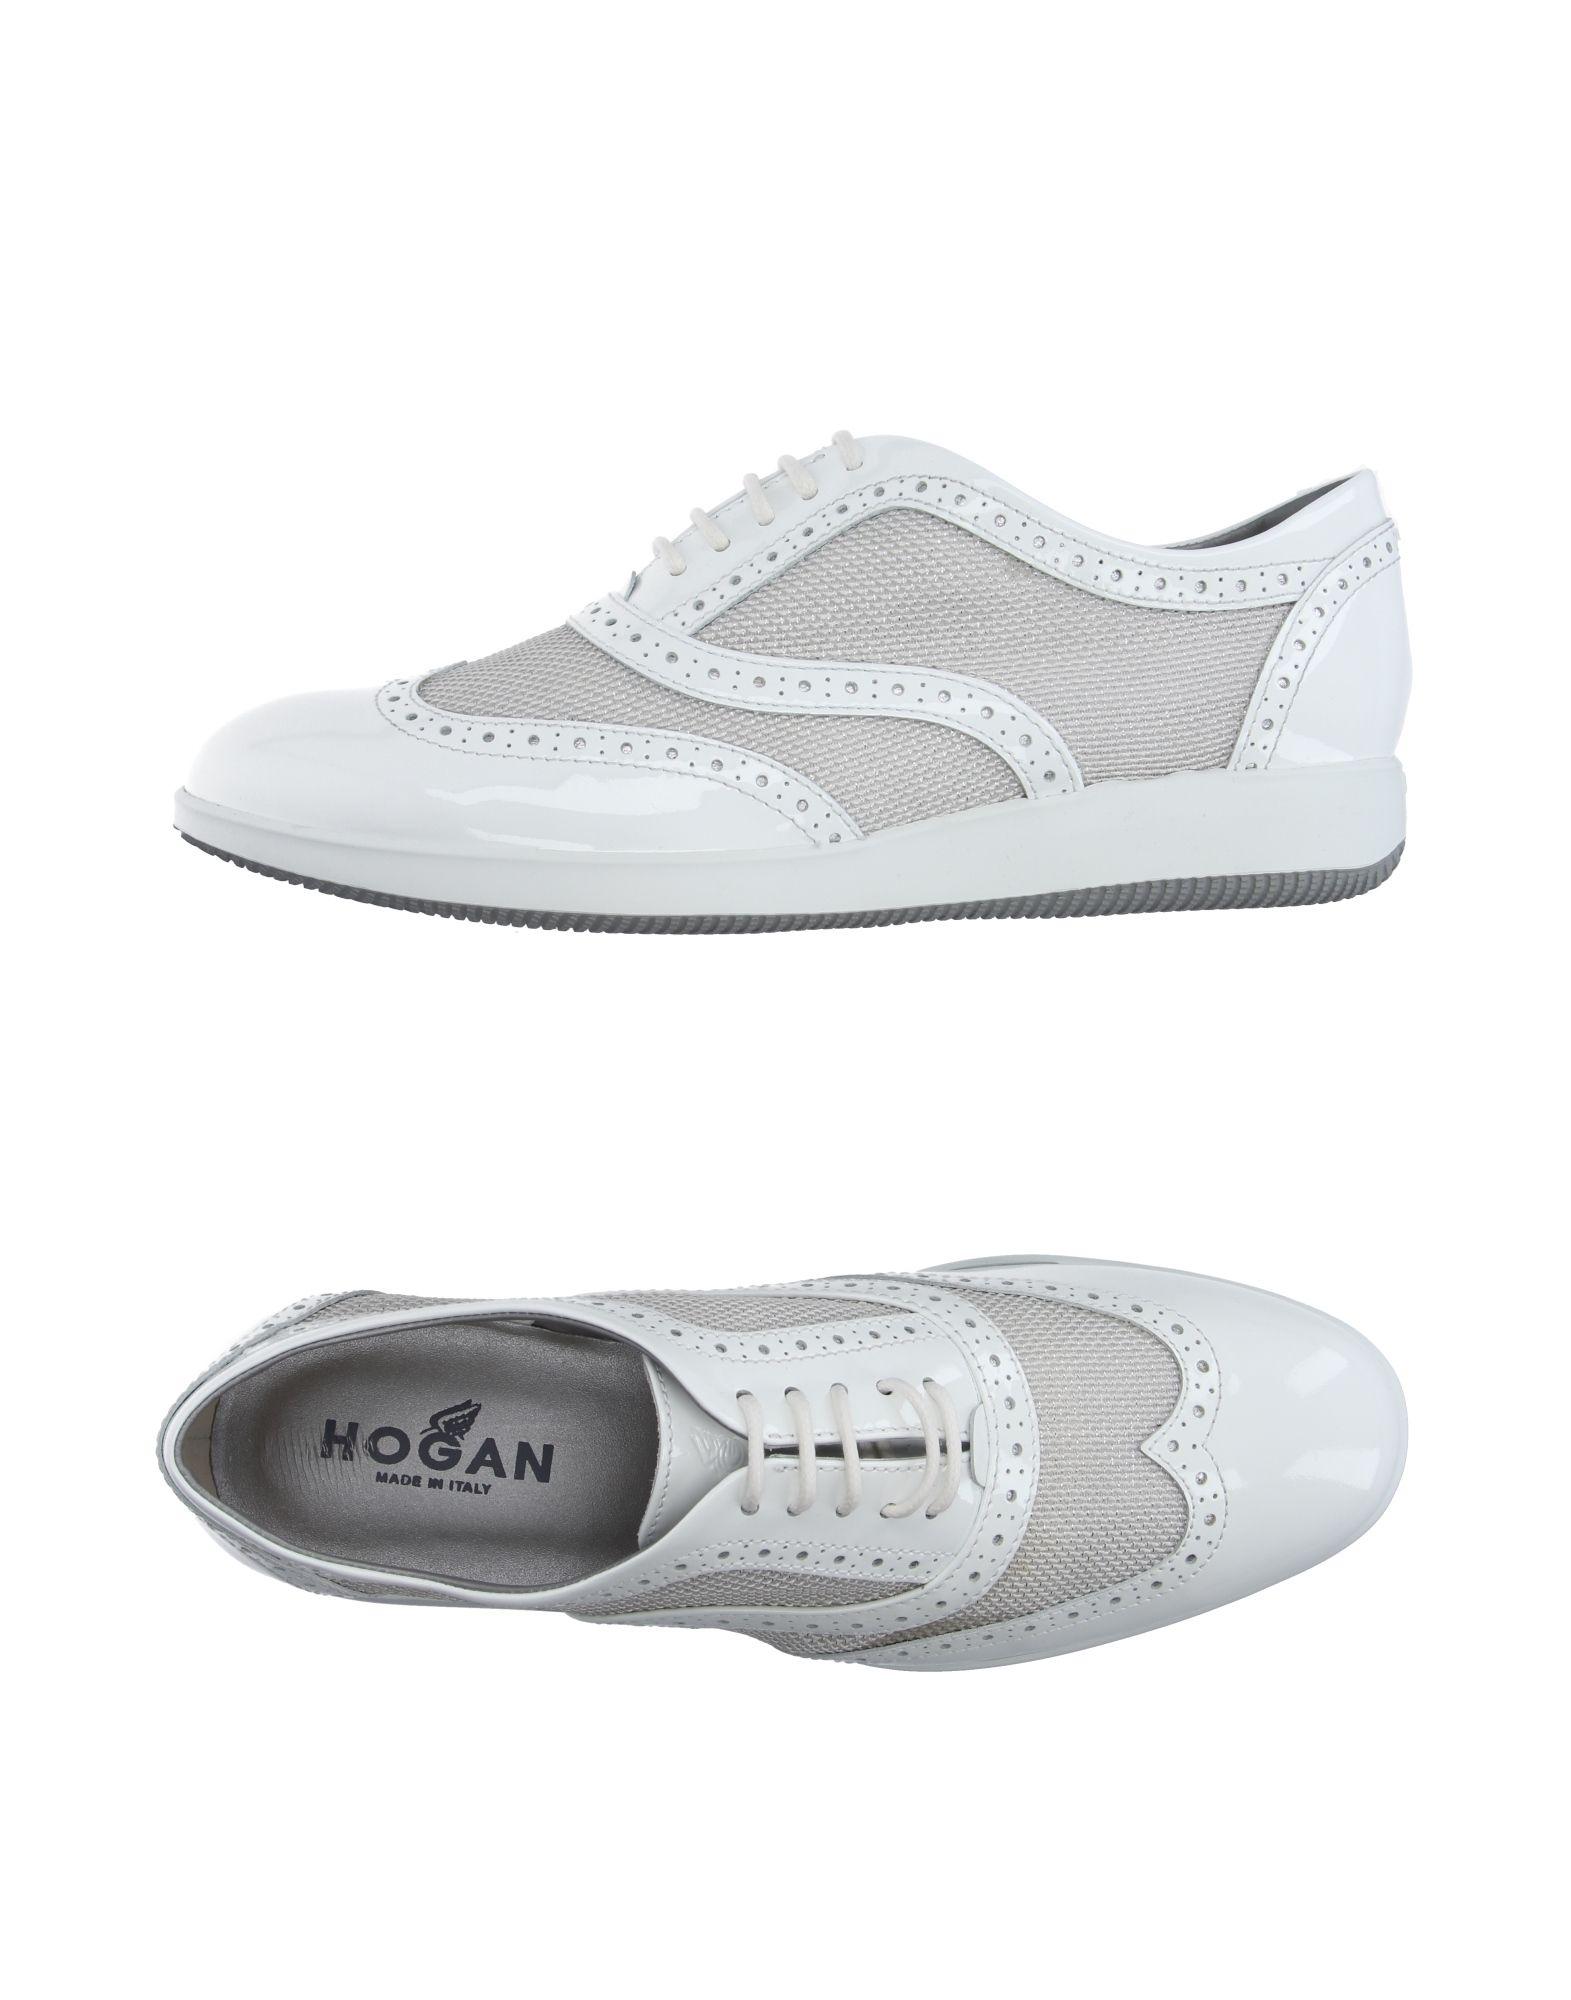 Moda Stringate Hogan Hogan Stringate Donna - 11120358WI 210864